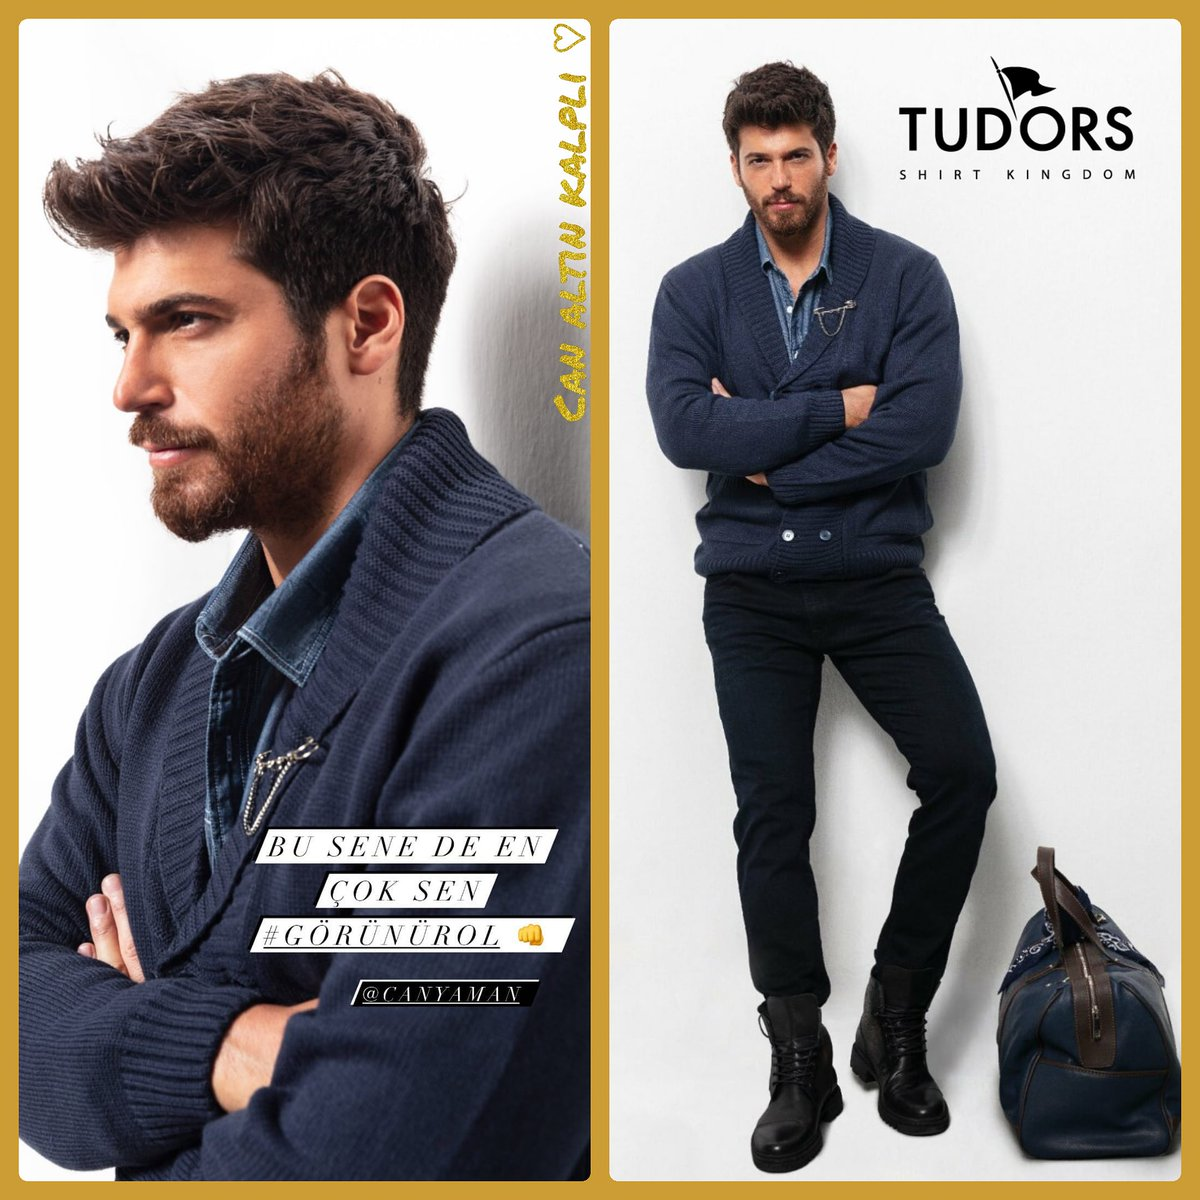 #Tudors